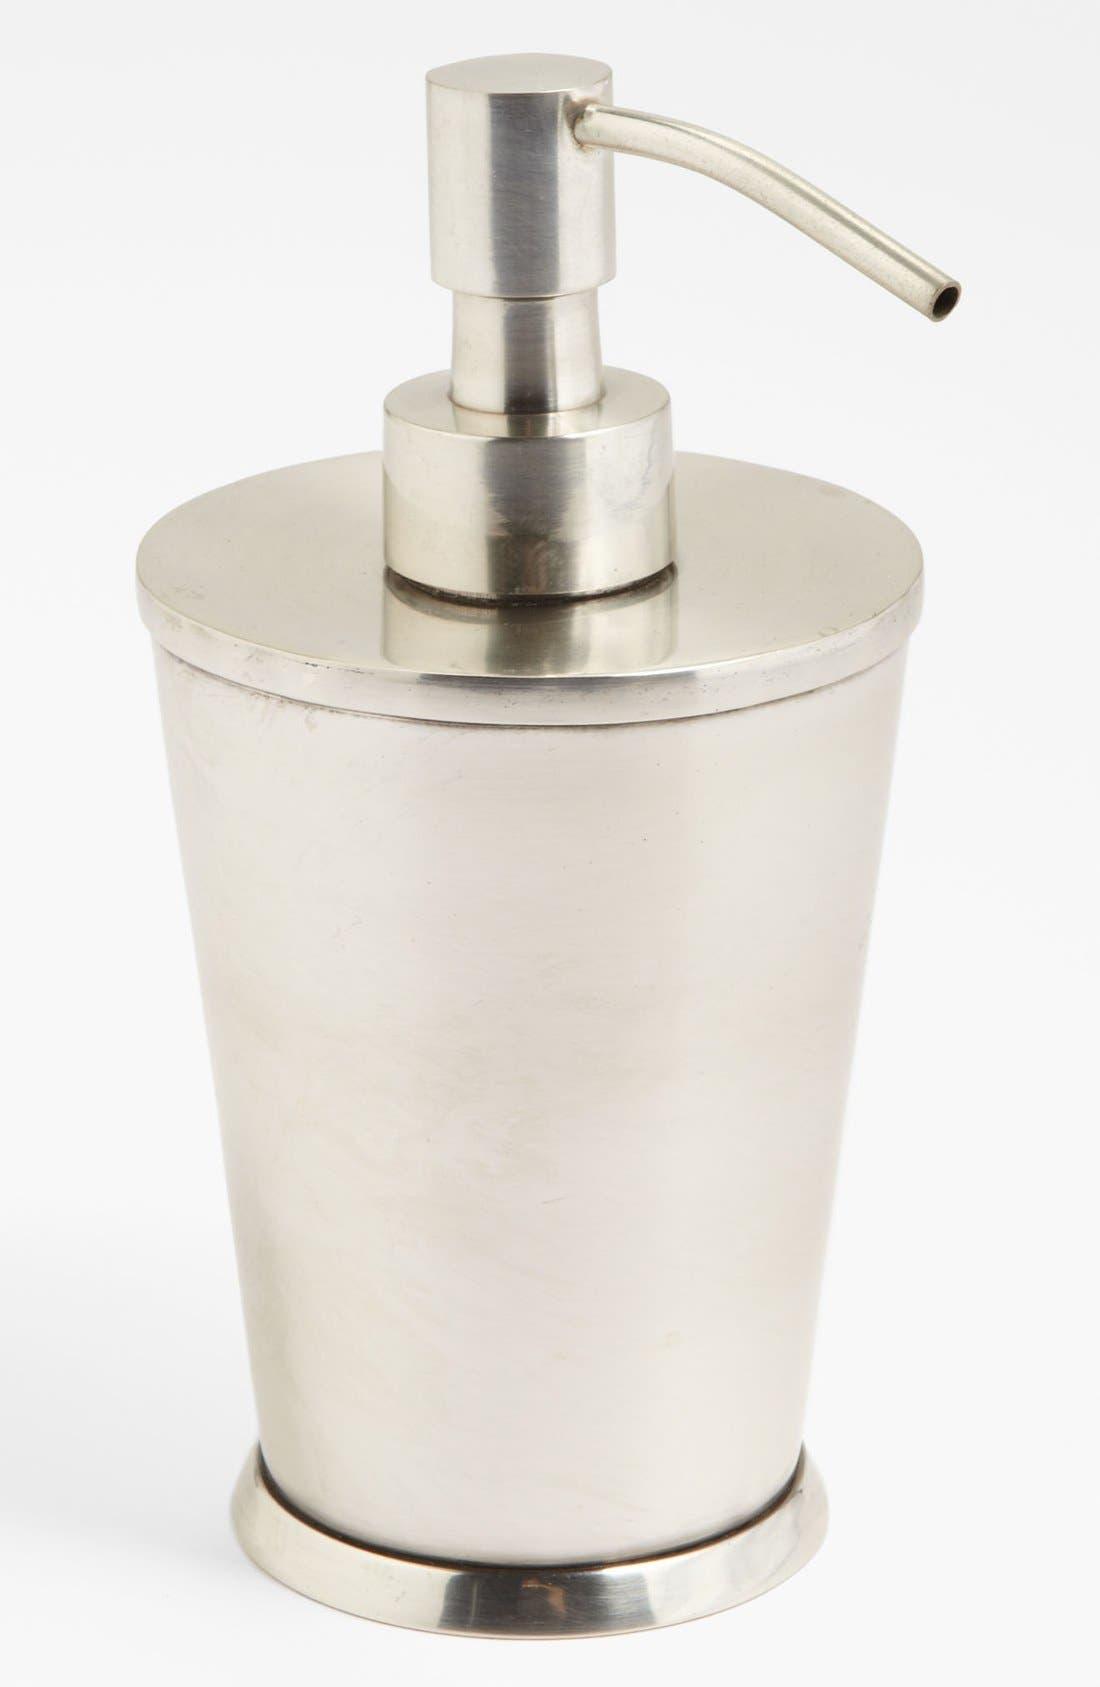 Studio 'Wallingford' Soap Dispenser,                             Main thumbnail 1, color,                             NICKEL